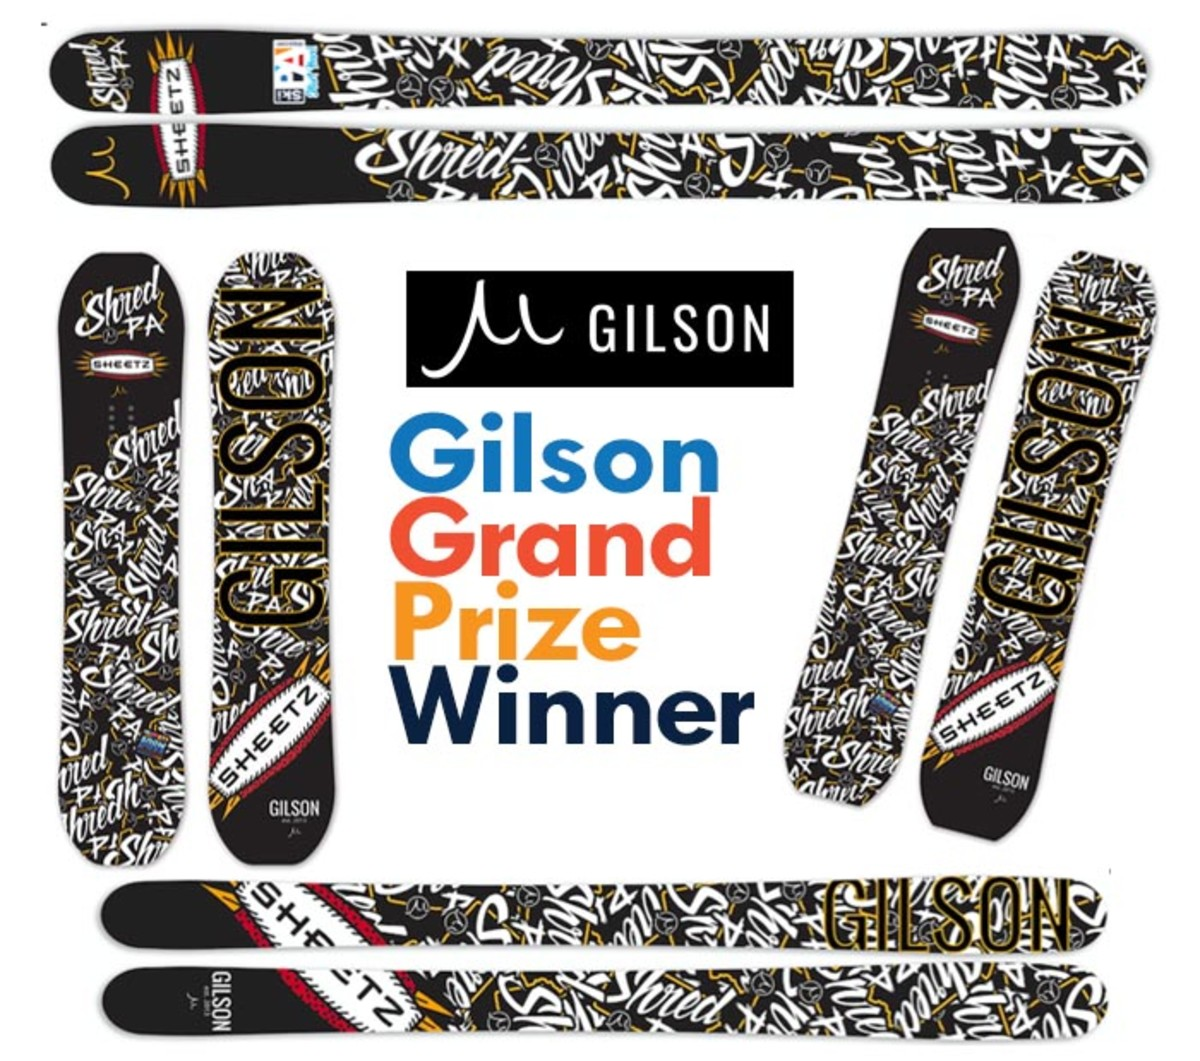 gilson_grand_prize